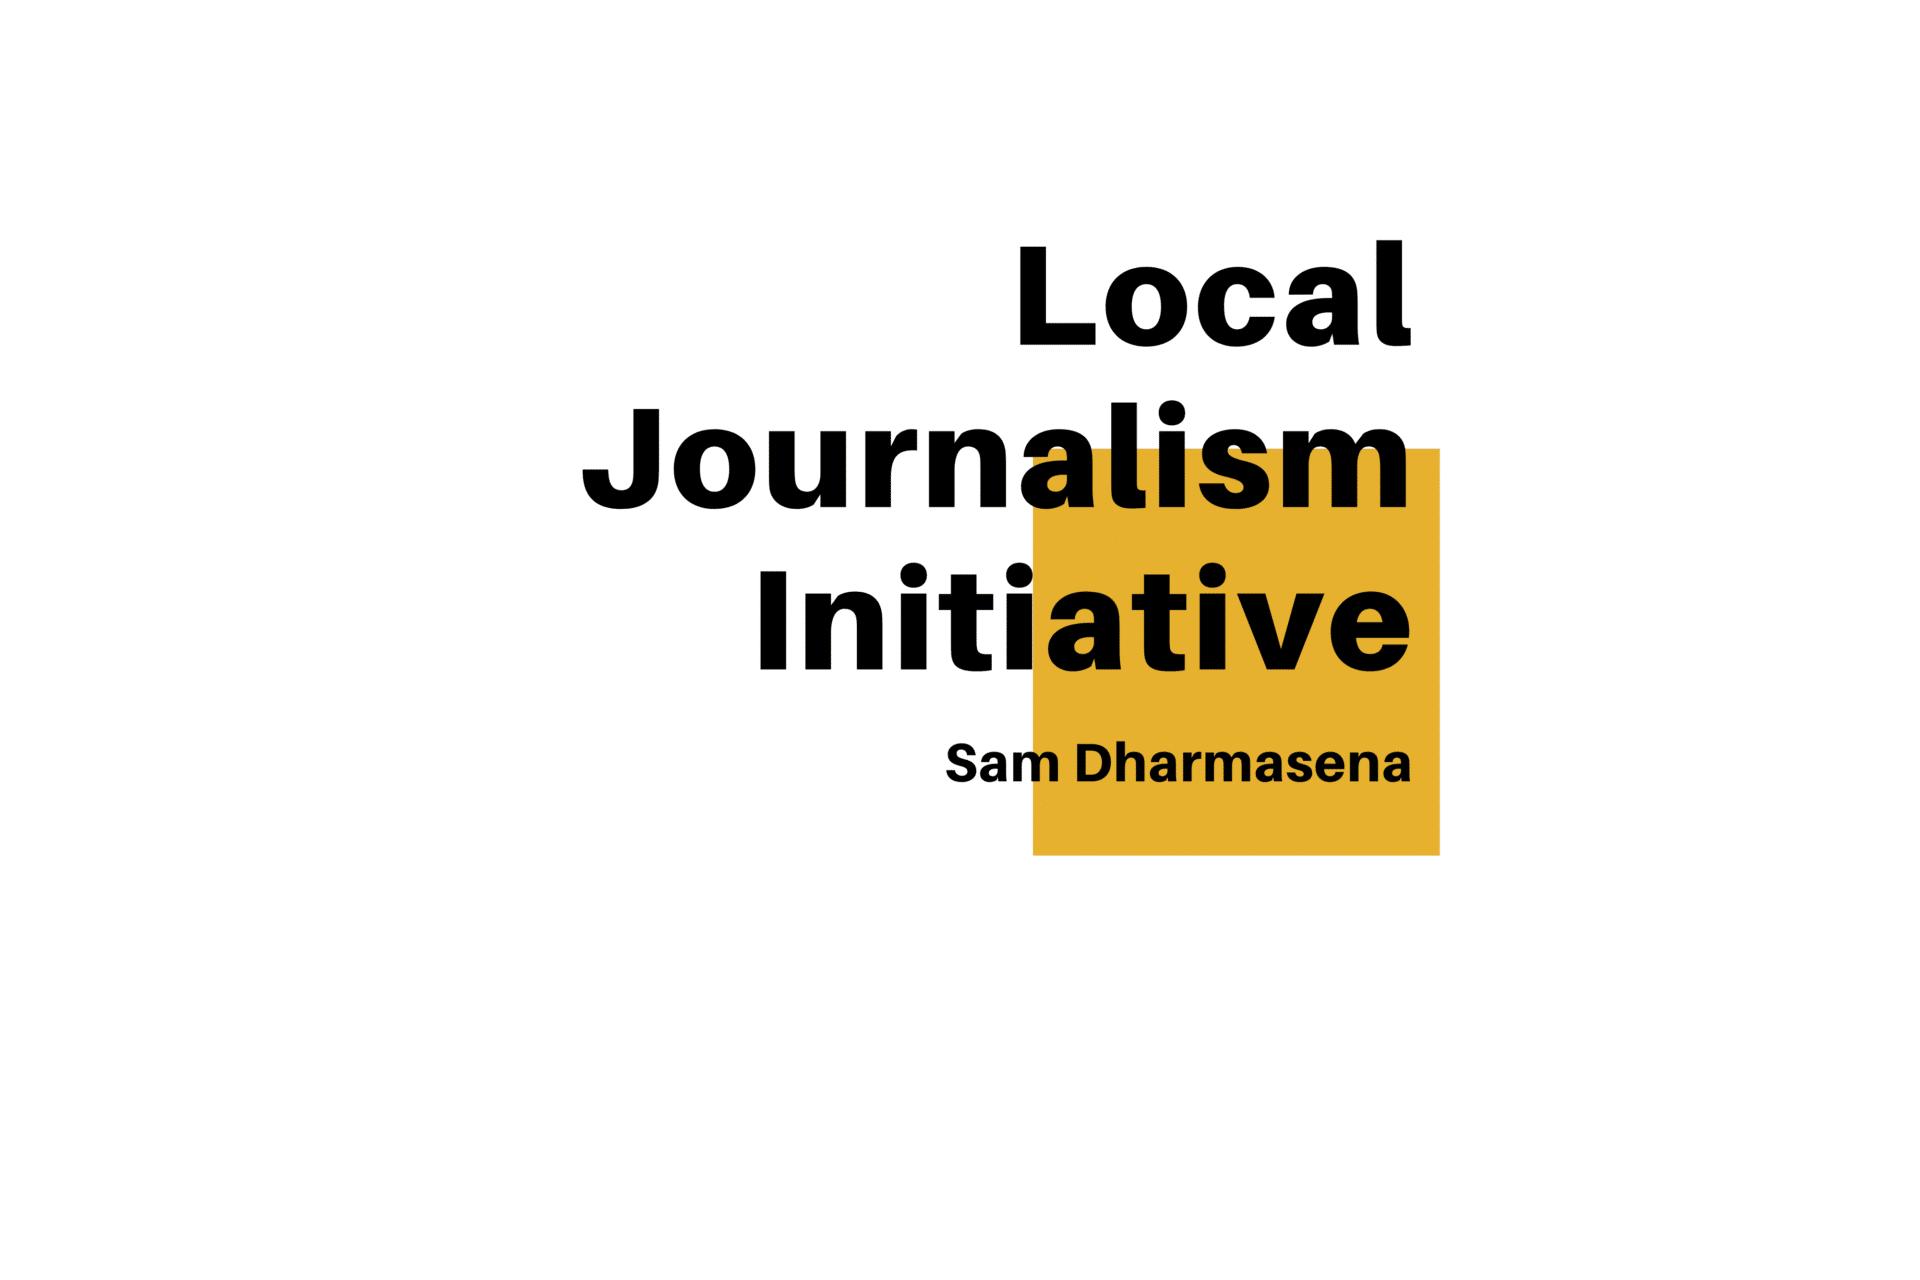 Local Journalism Initiative - Sam Dharmasena Title Card